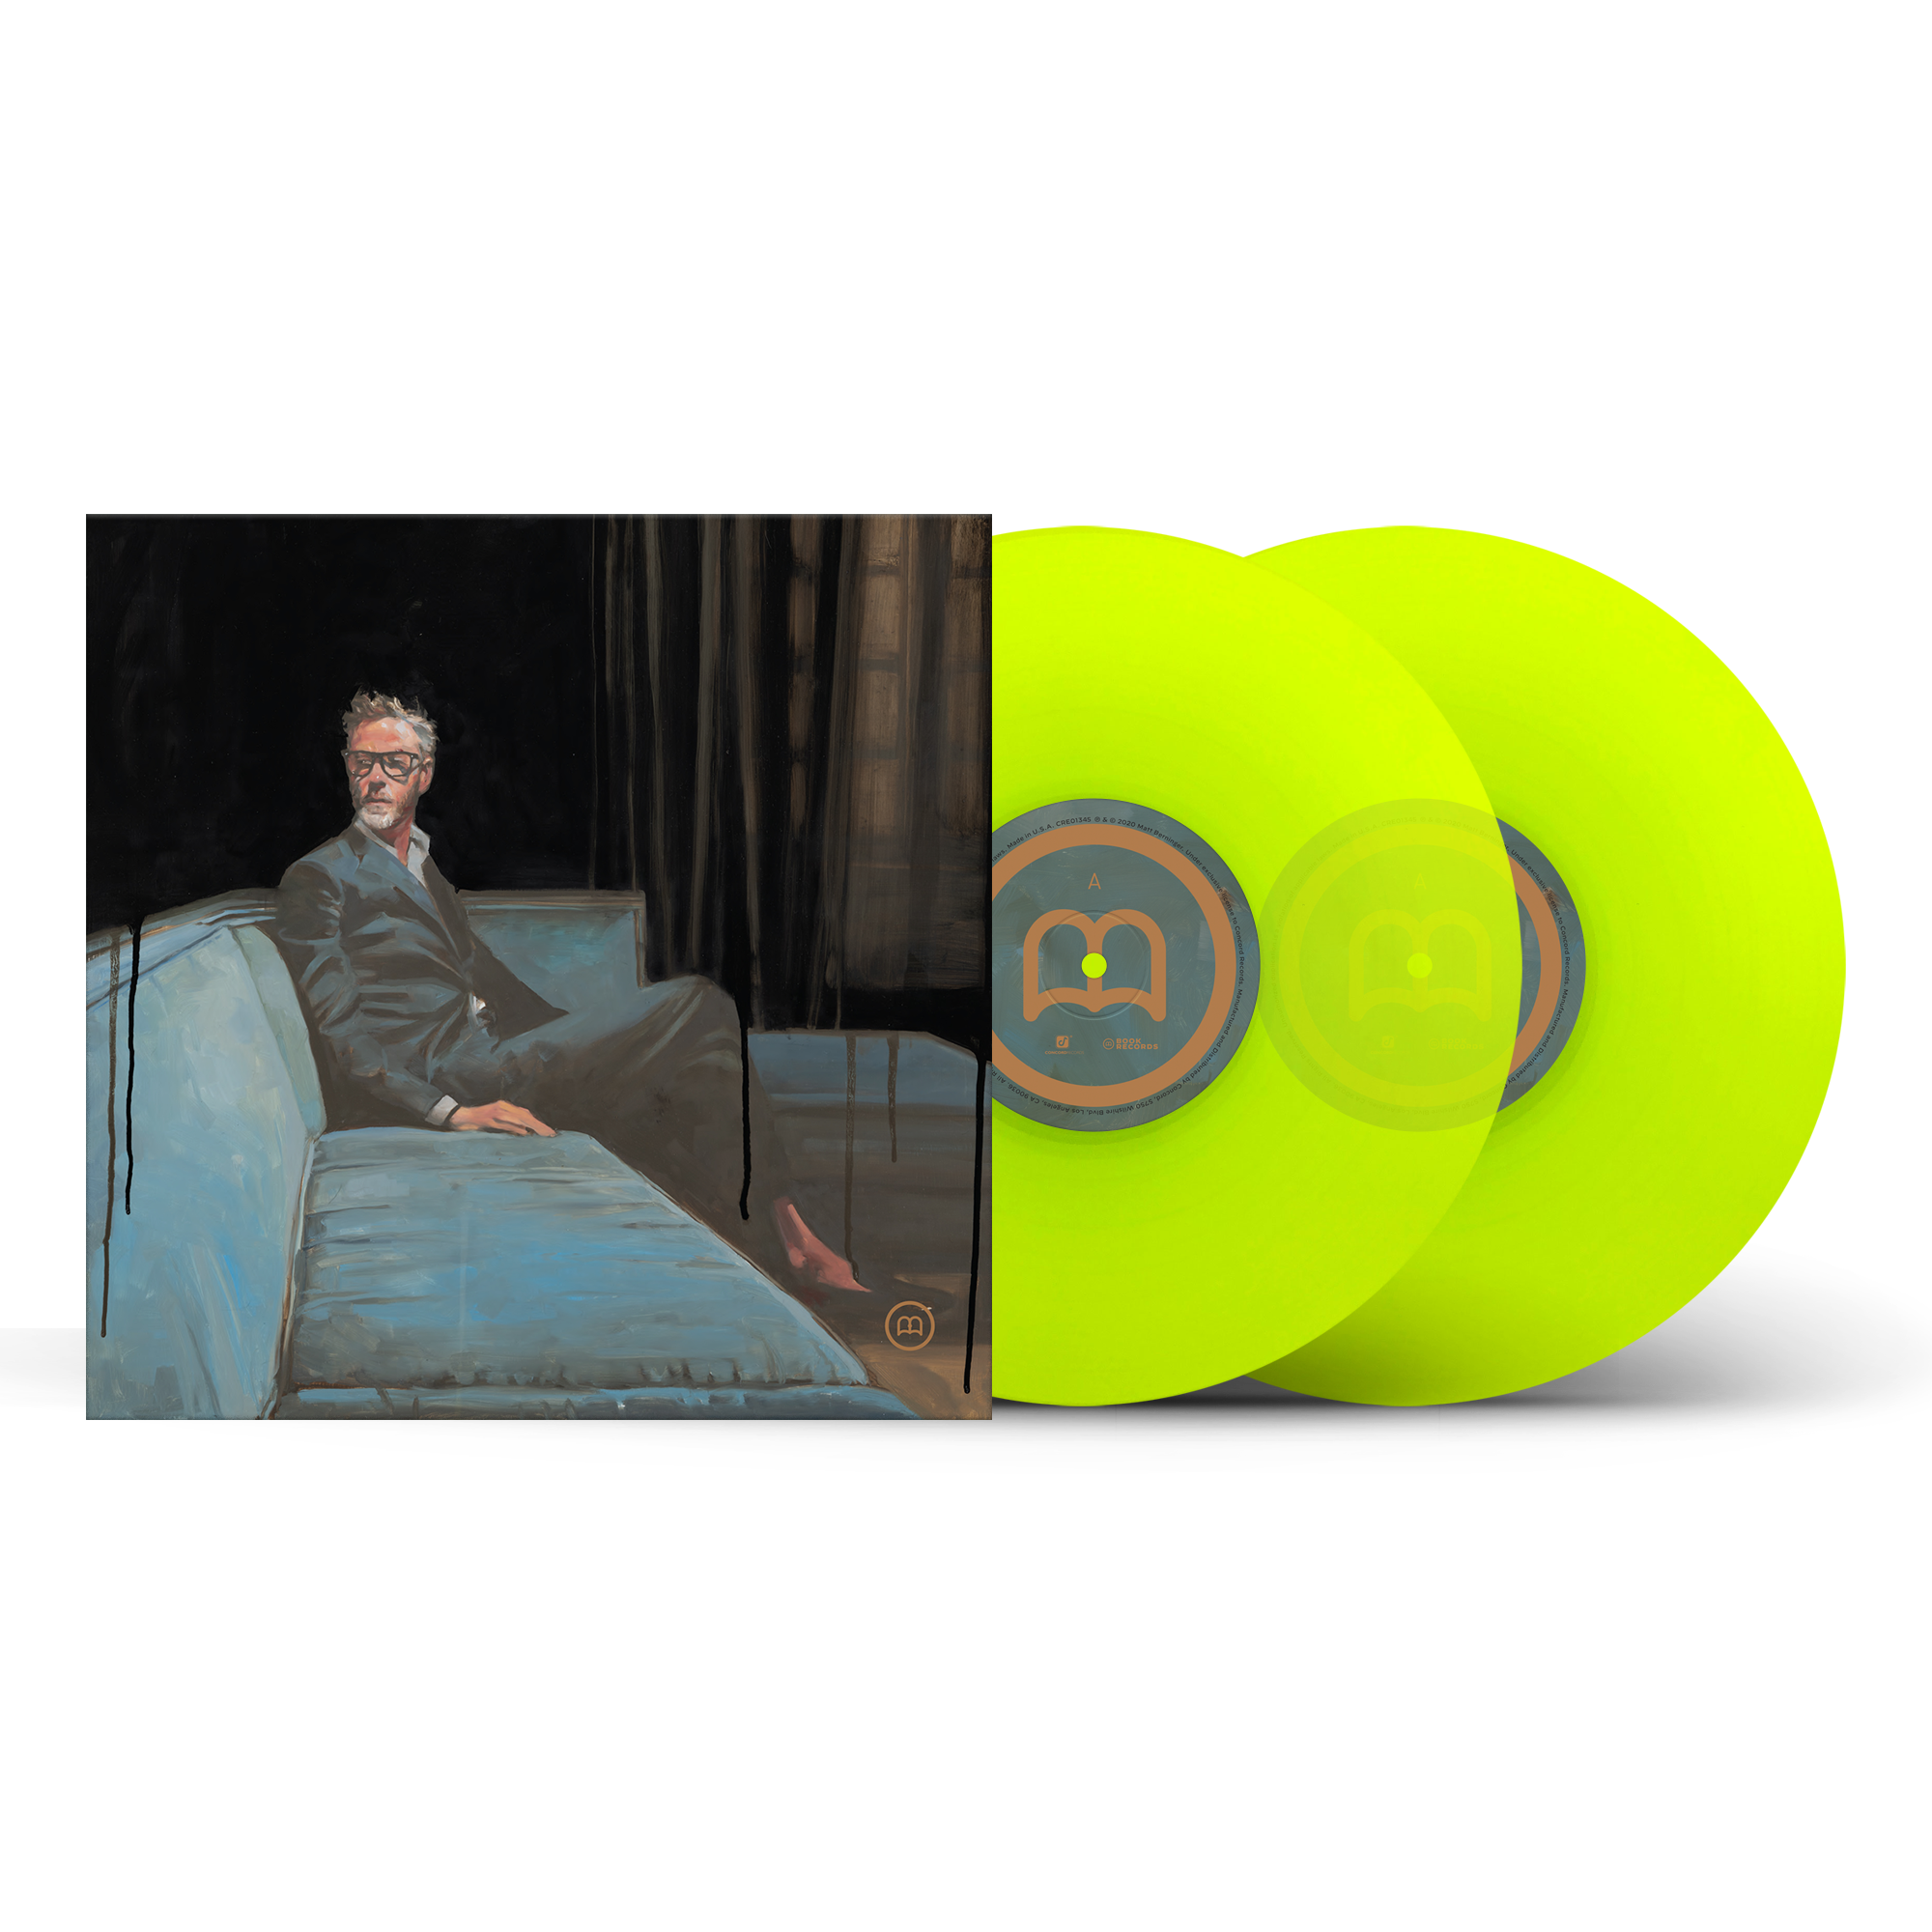 Serpentine Prison Translucent Chartreuse Deluxe 2xLP